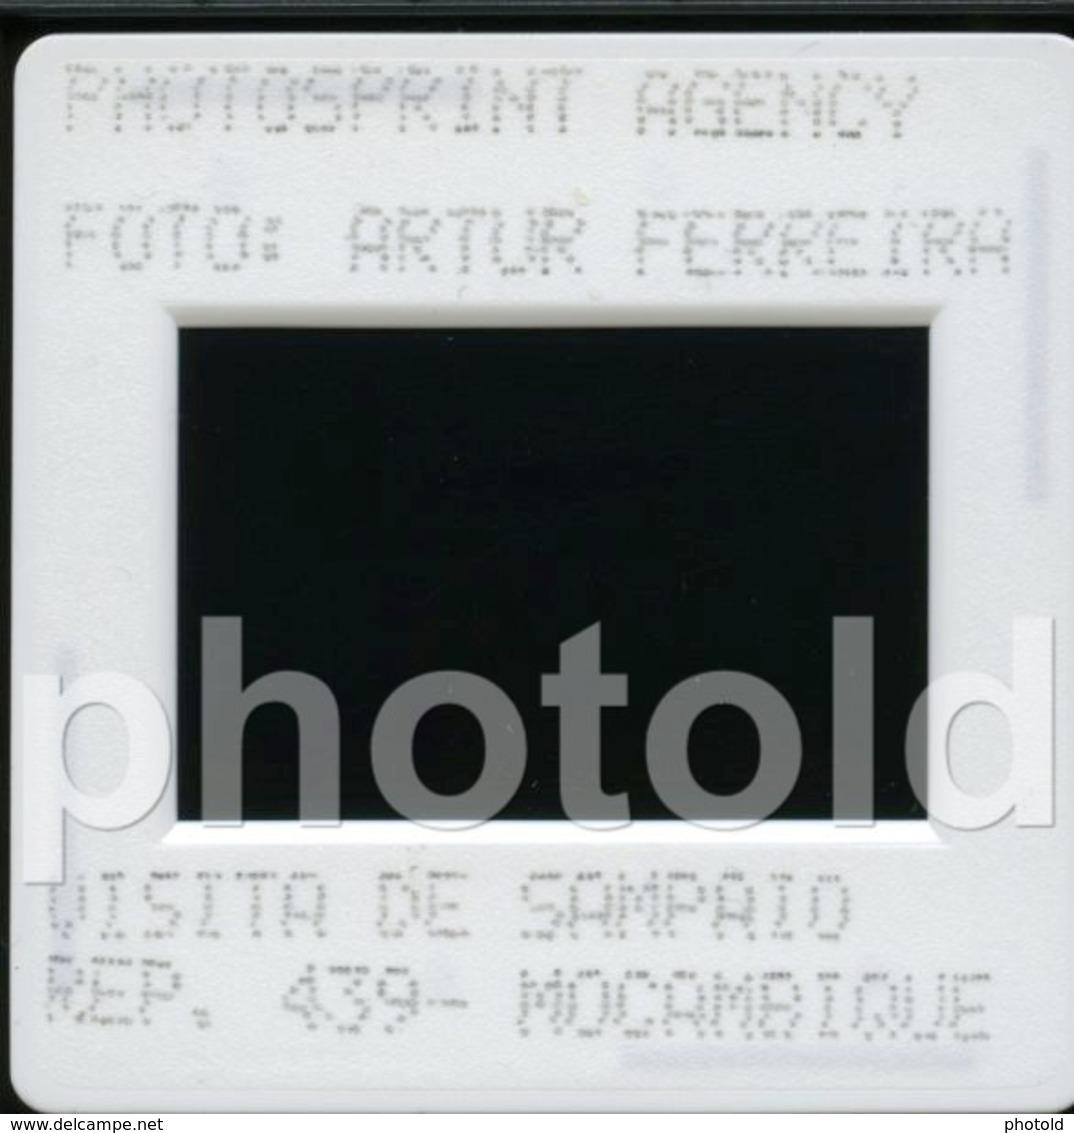 1997 PRESIDENTE PORTUGAL VISITA MOZAMBIQUE PLANE TAP AFRICA AFRIQUE 35mm PRESS DIAPOSITIVE SLIDE Not PHOTO No FOTO B4923 - Diapositives